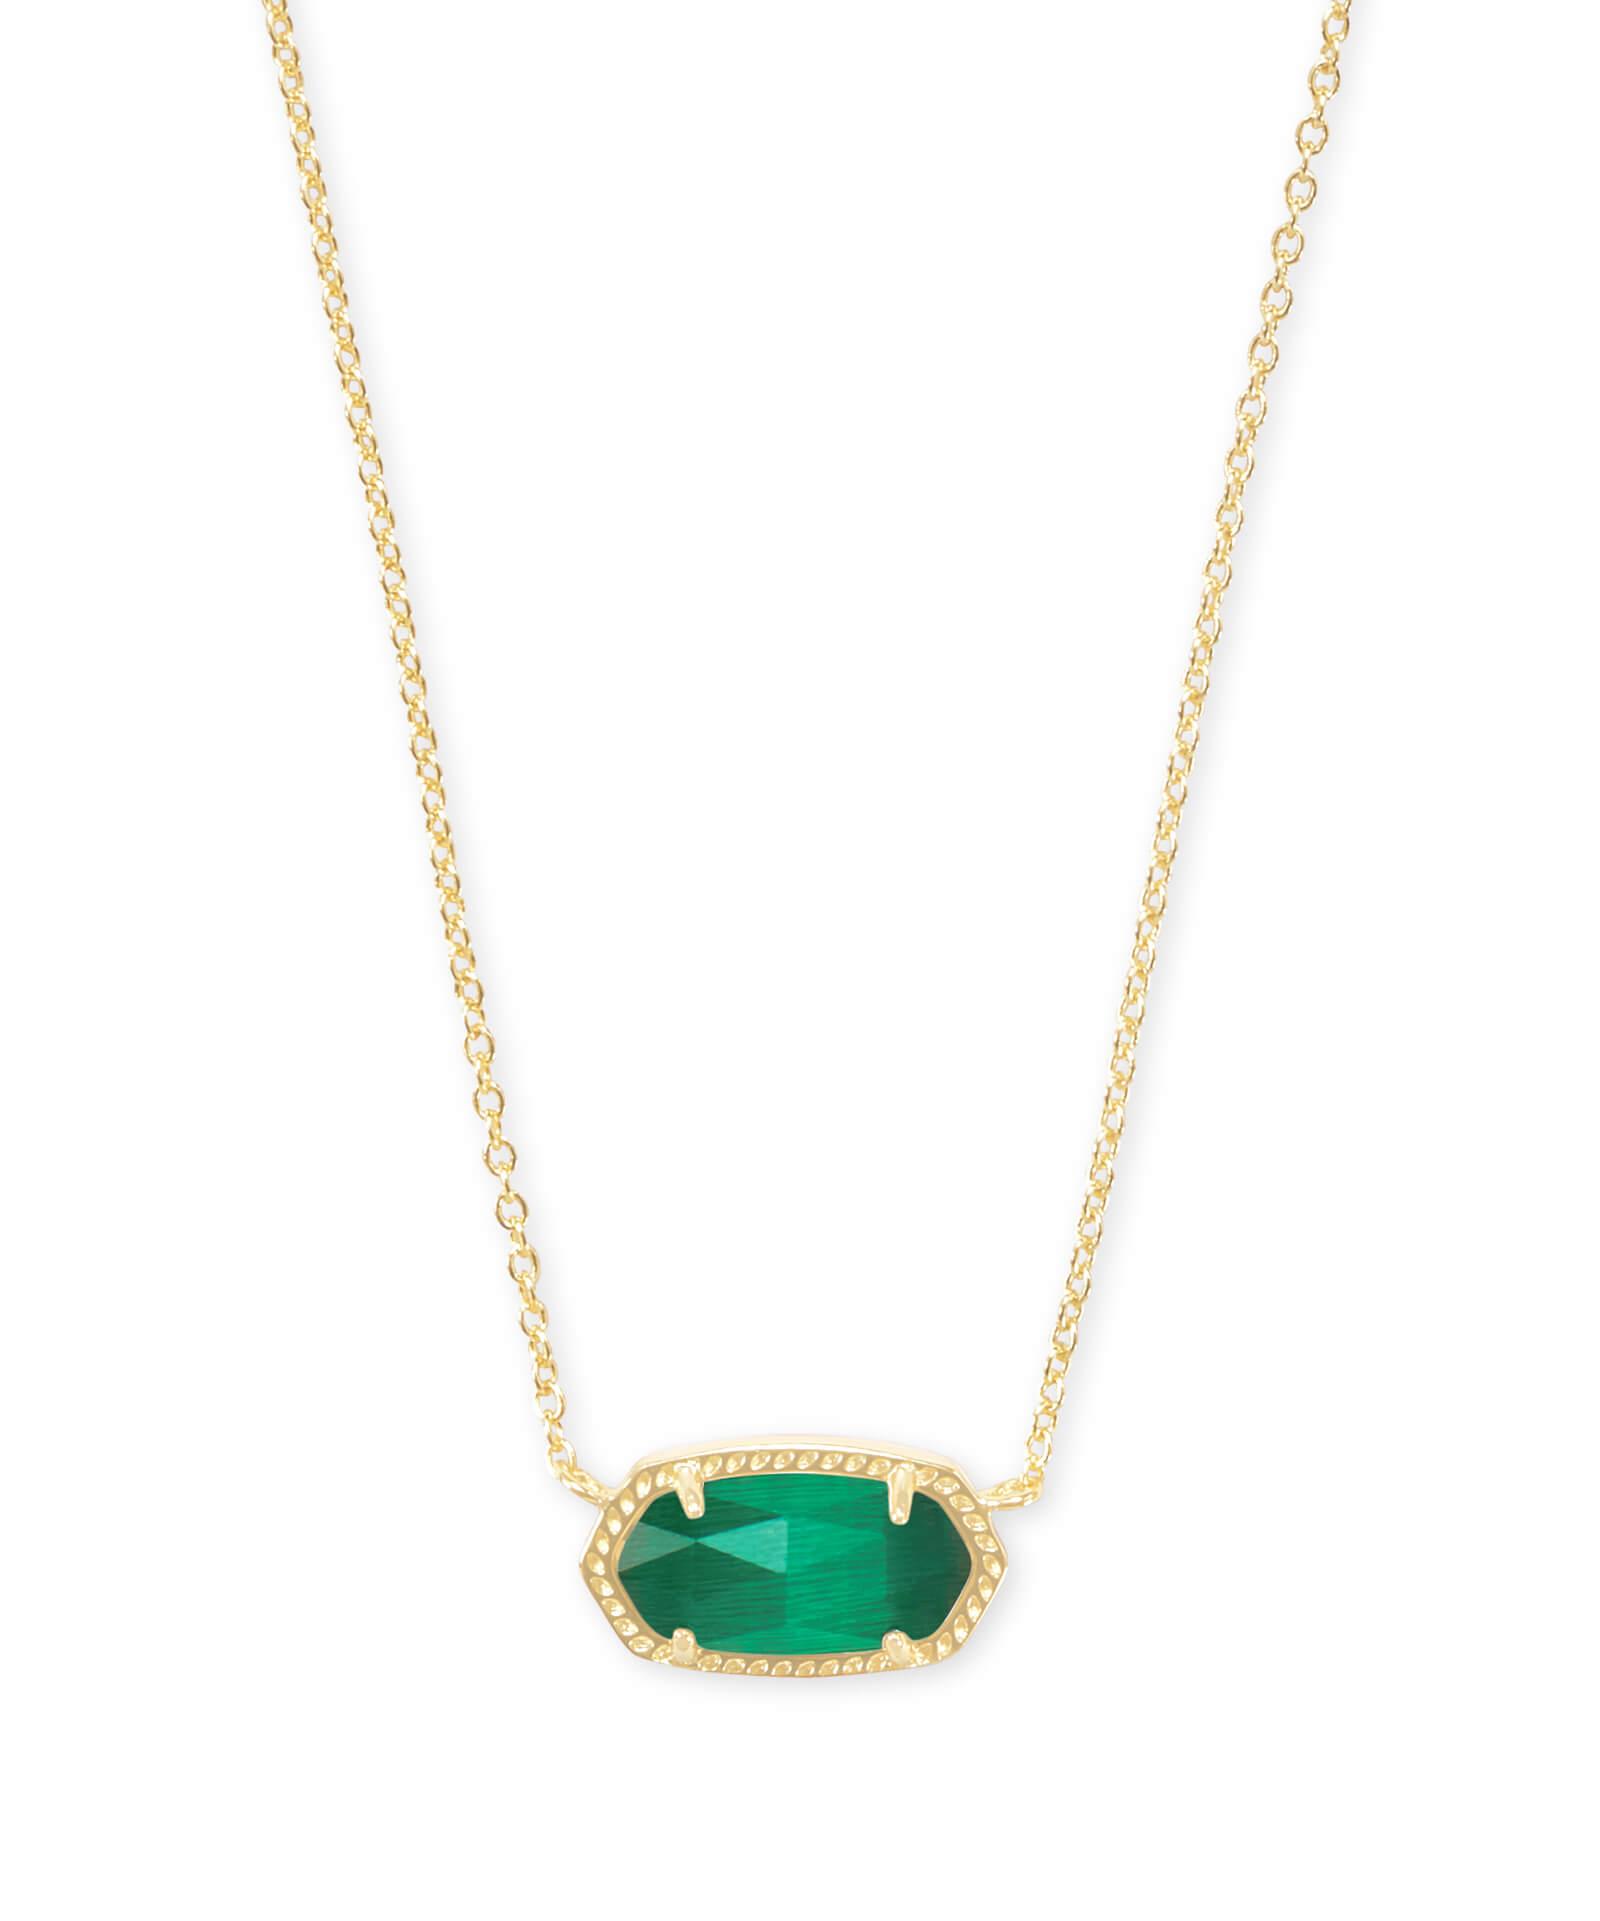 fe155404a125a Elisa Gold Pendant Necklace in Emerald Cat's Eye   Kendra Scott